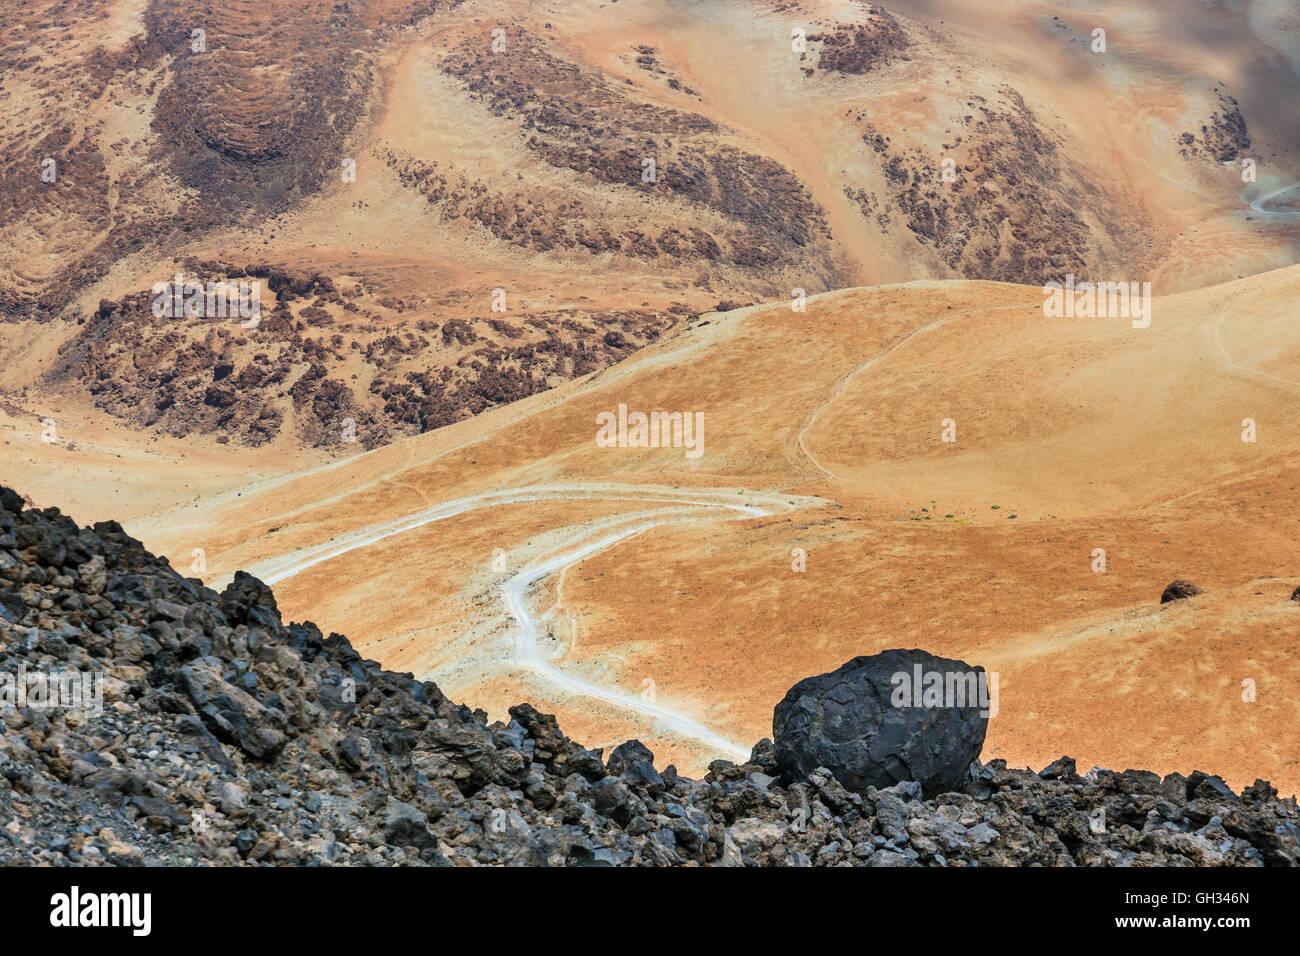 Volcanic bombs on Volcanic bombs on Montana Blanca, Teide National Park, Tenerife, Canary Islands, Spain, shalow - Stock Image